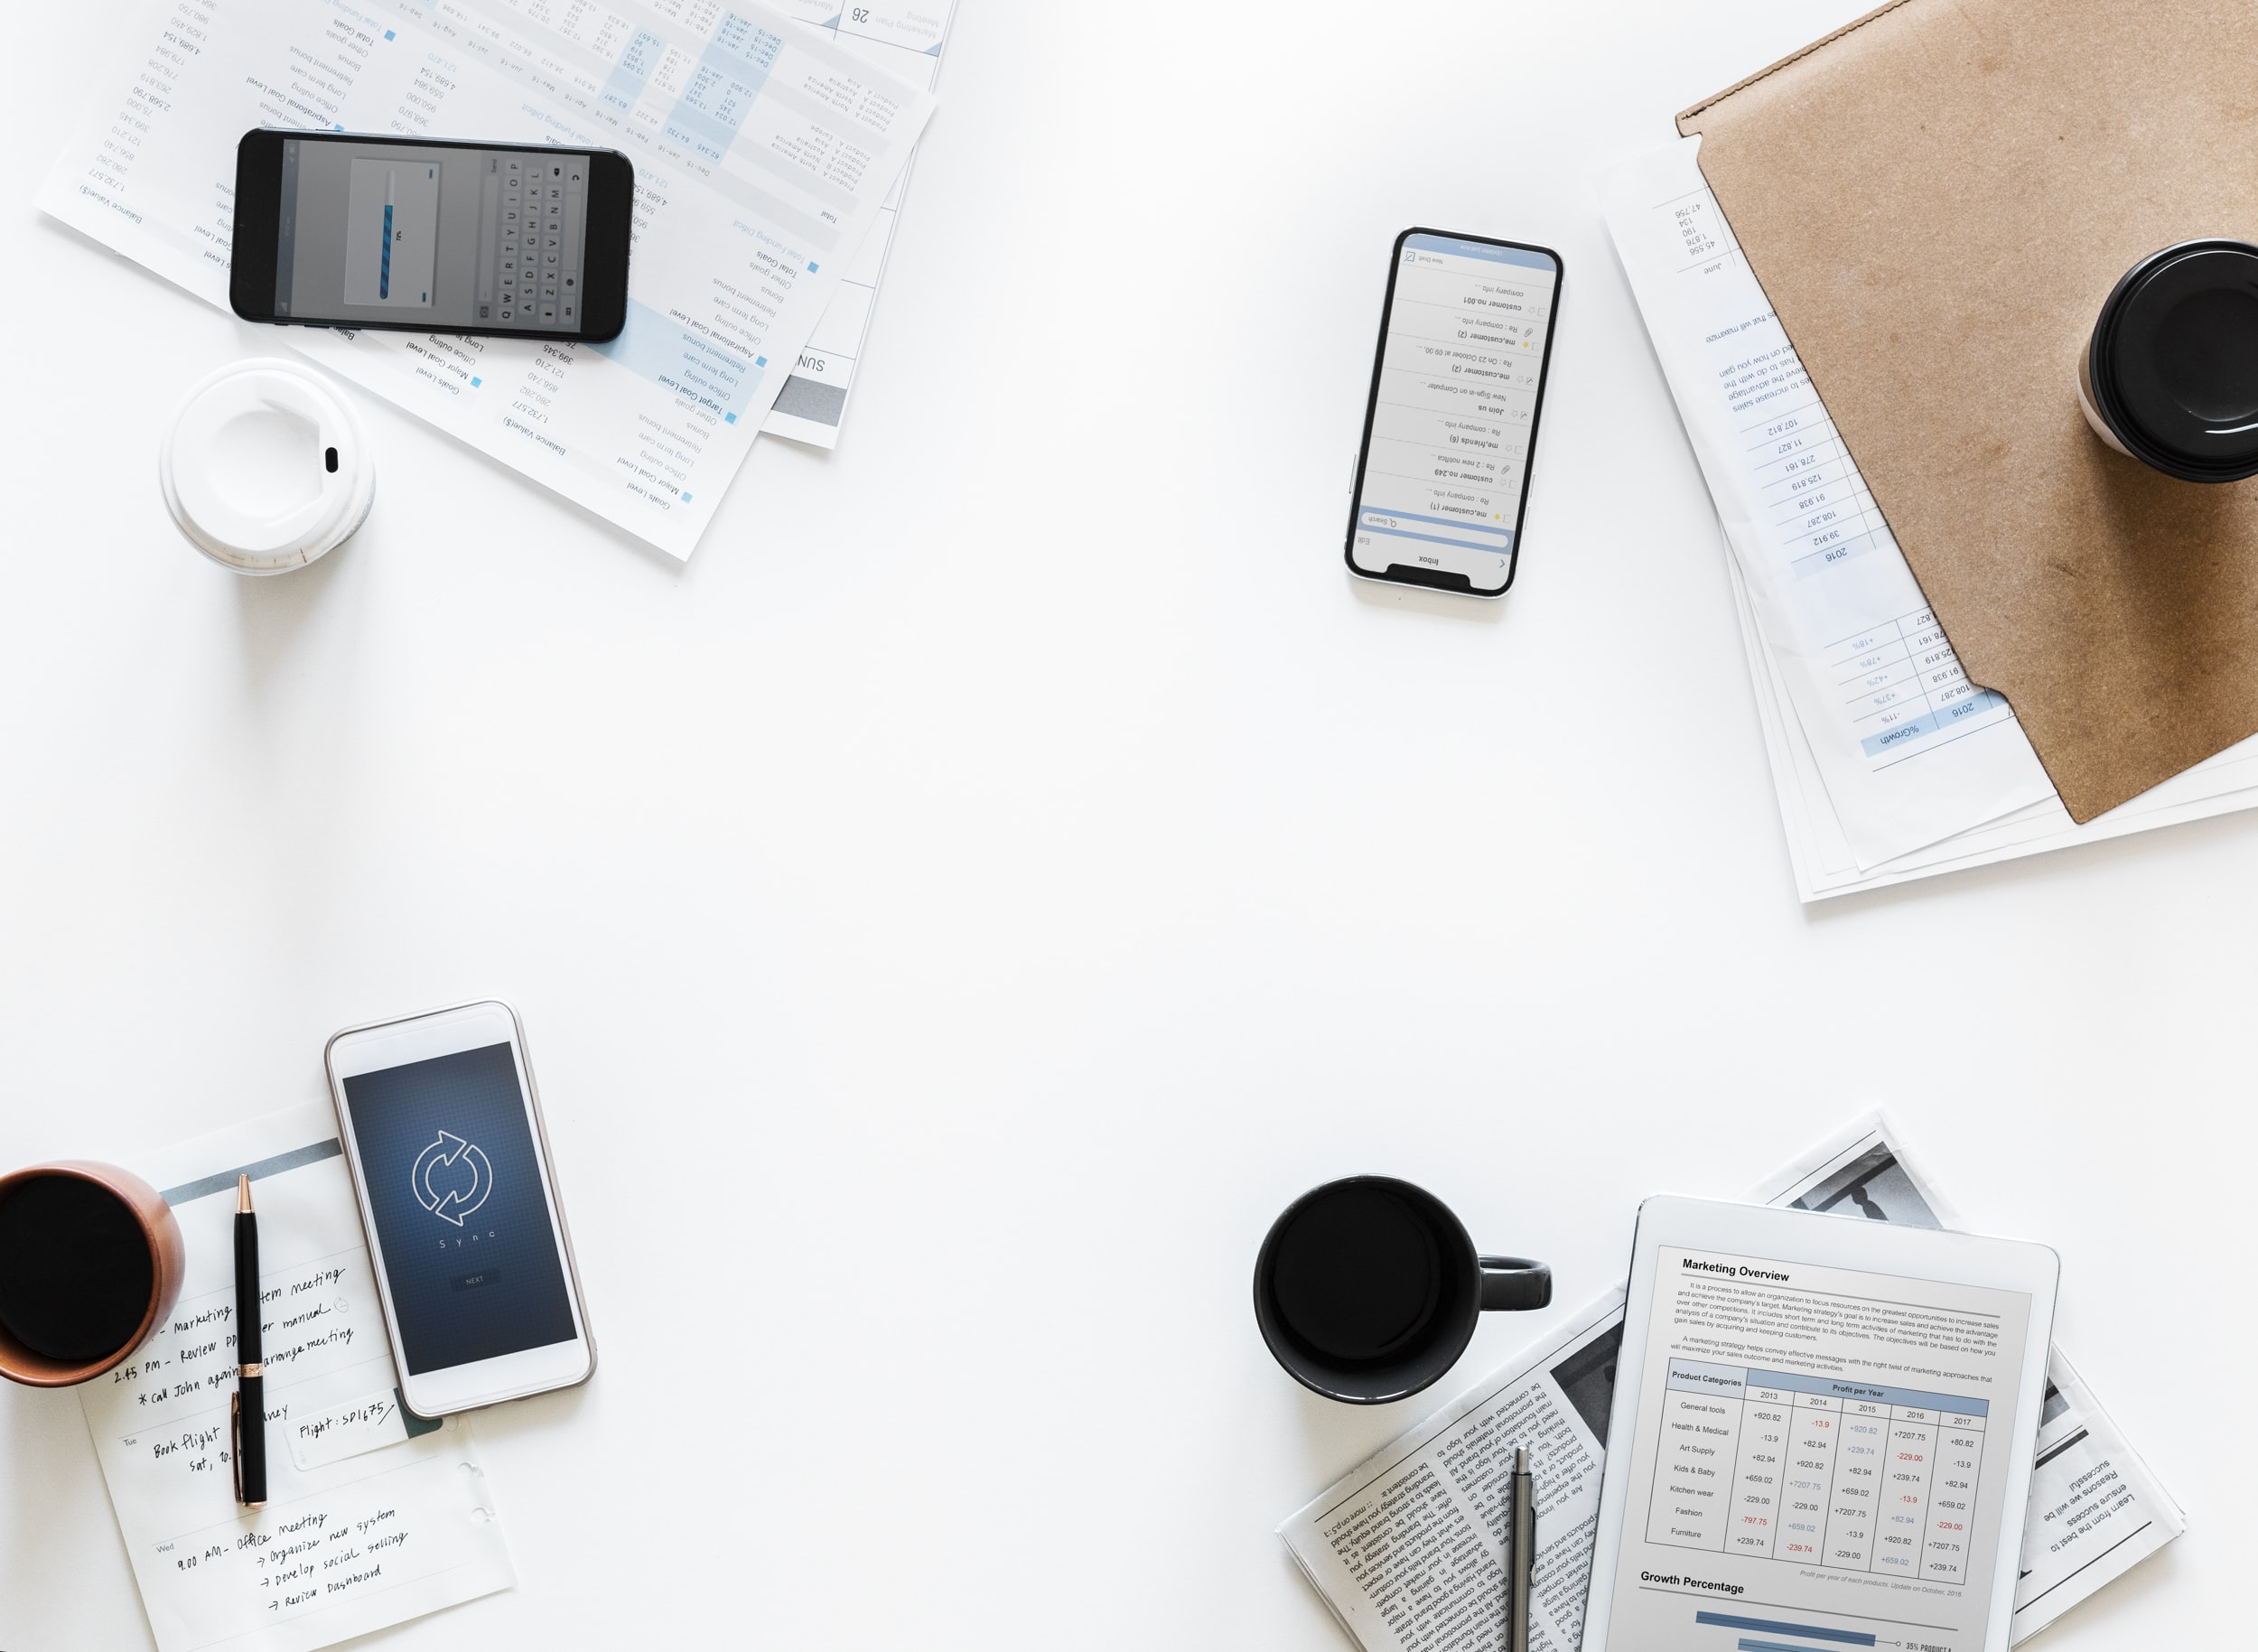 white Android smartphone near black smartphone